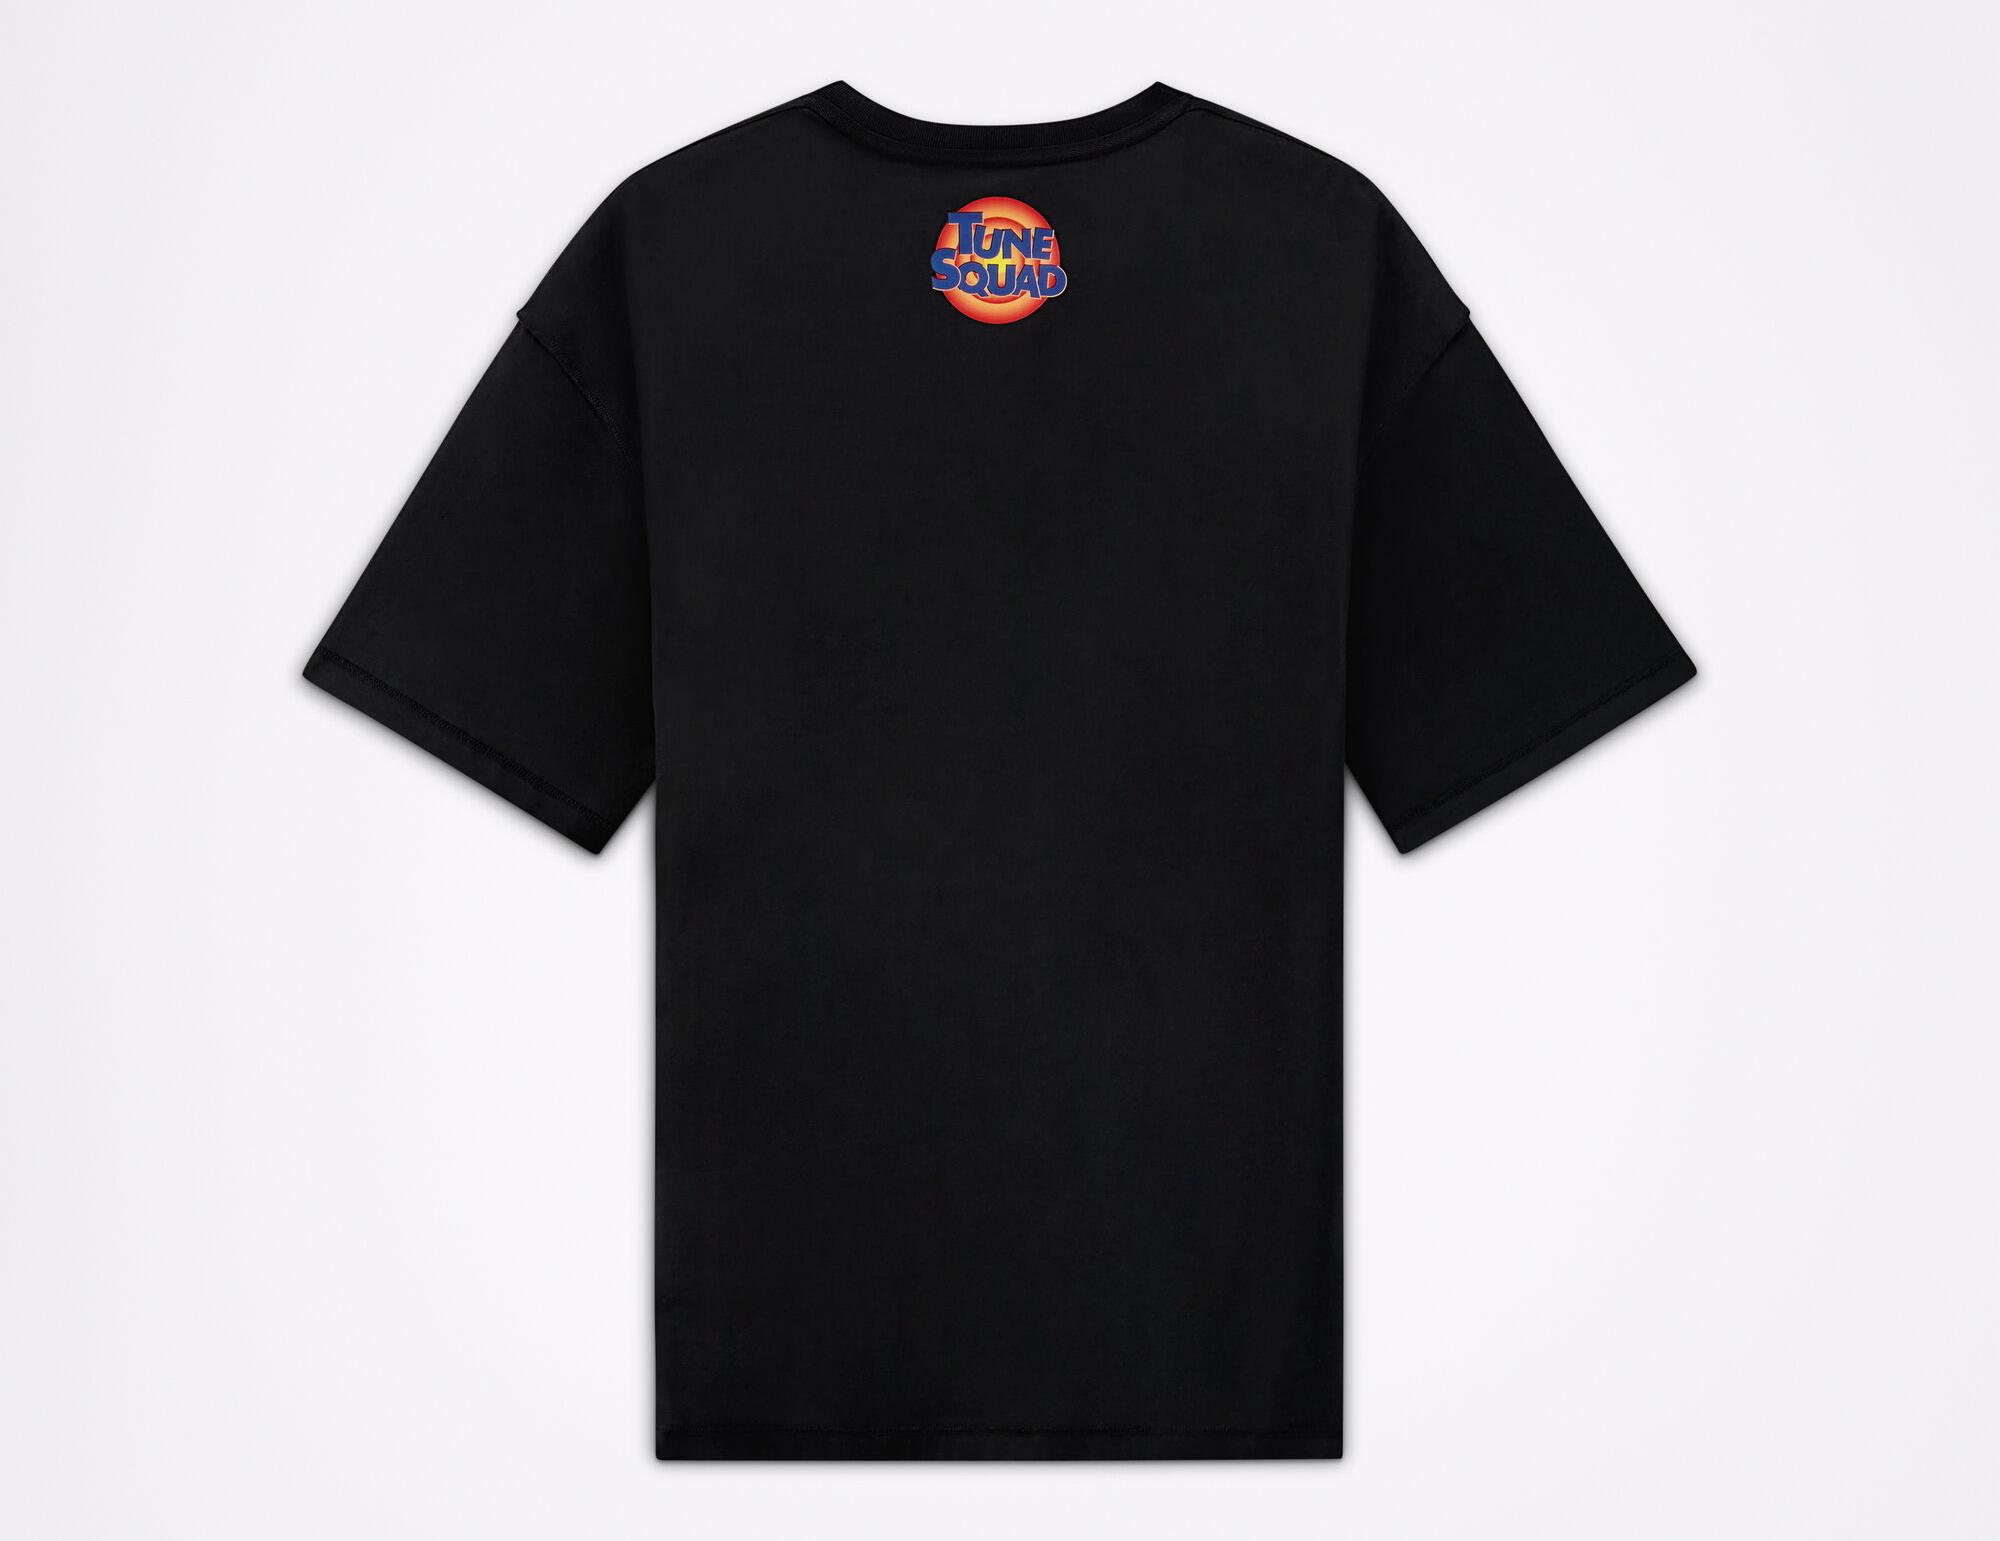 converse-space-jam-tune-squad-taz-shirt-1